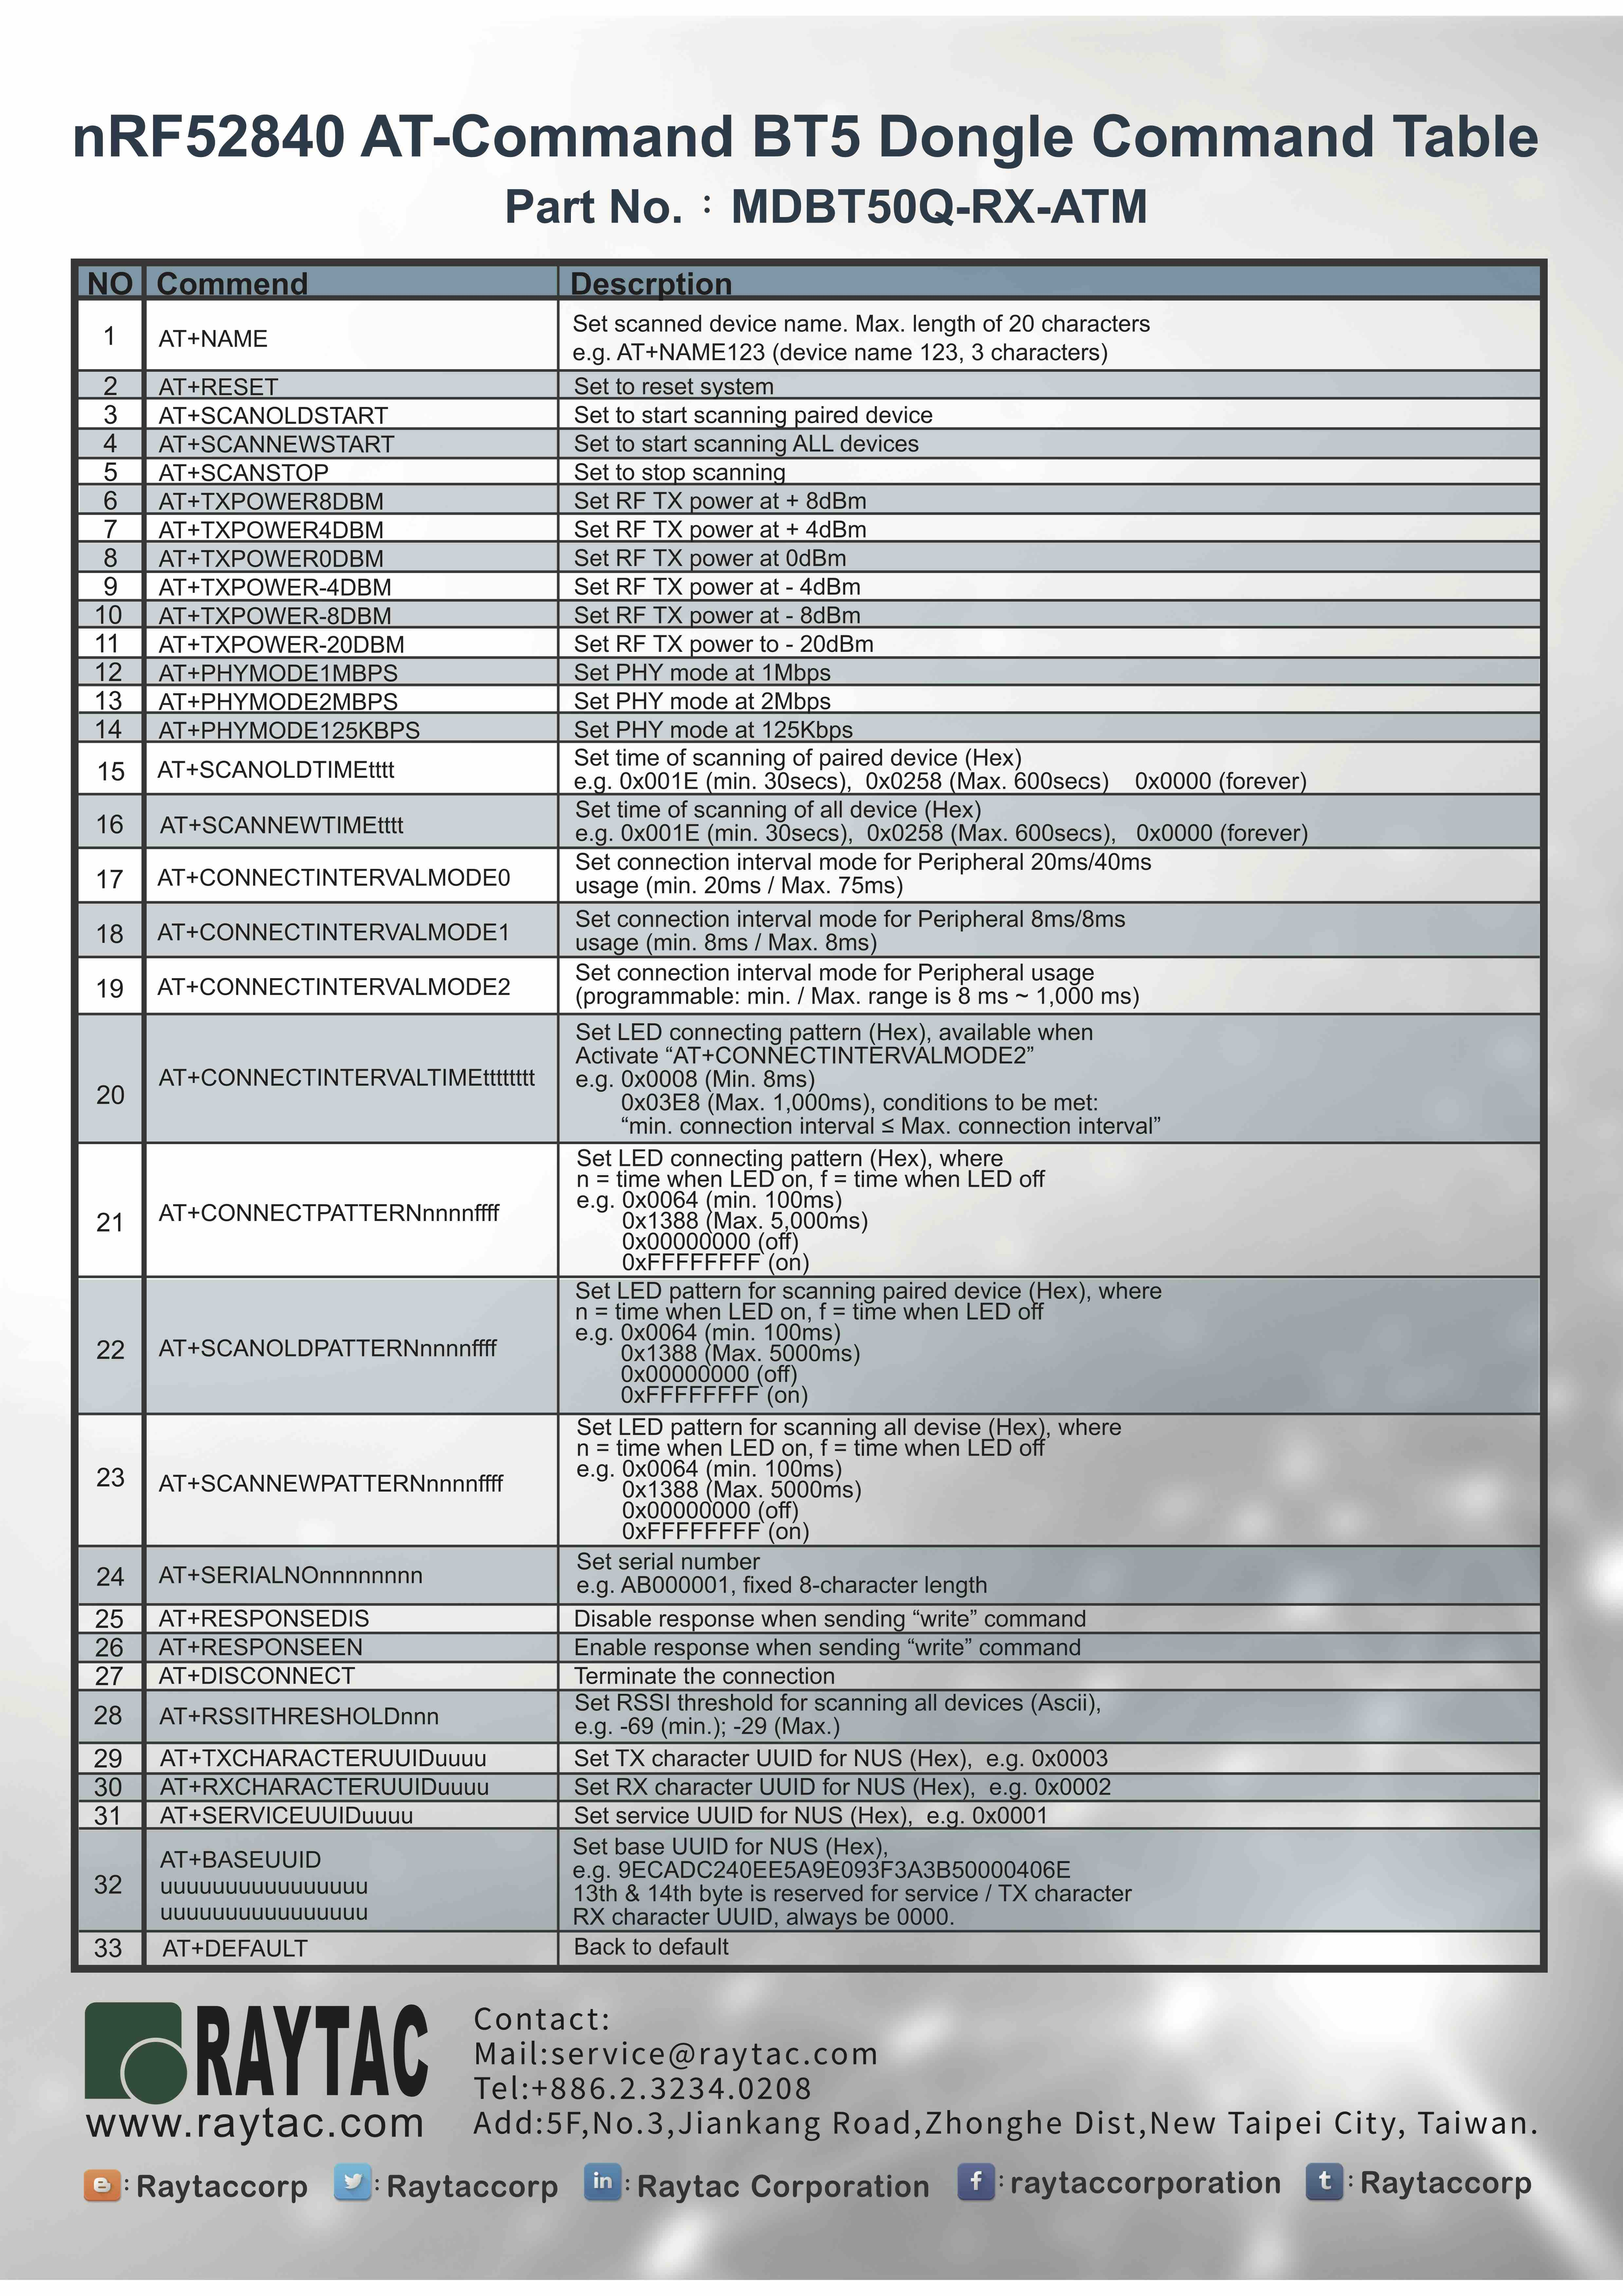 MDBT50Q-RX-ATM-2 Command Table.jpg